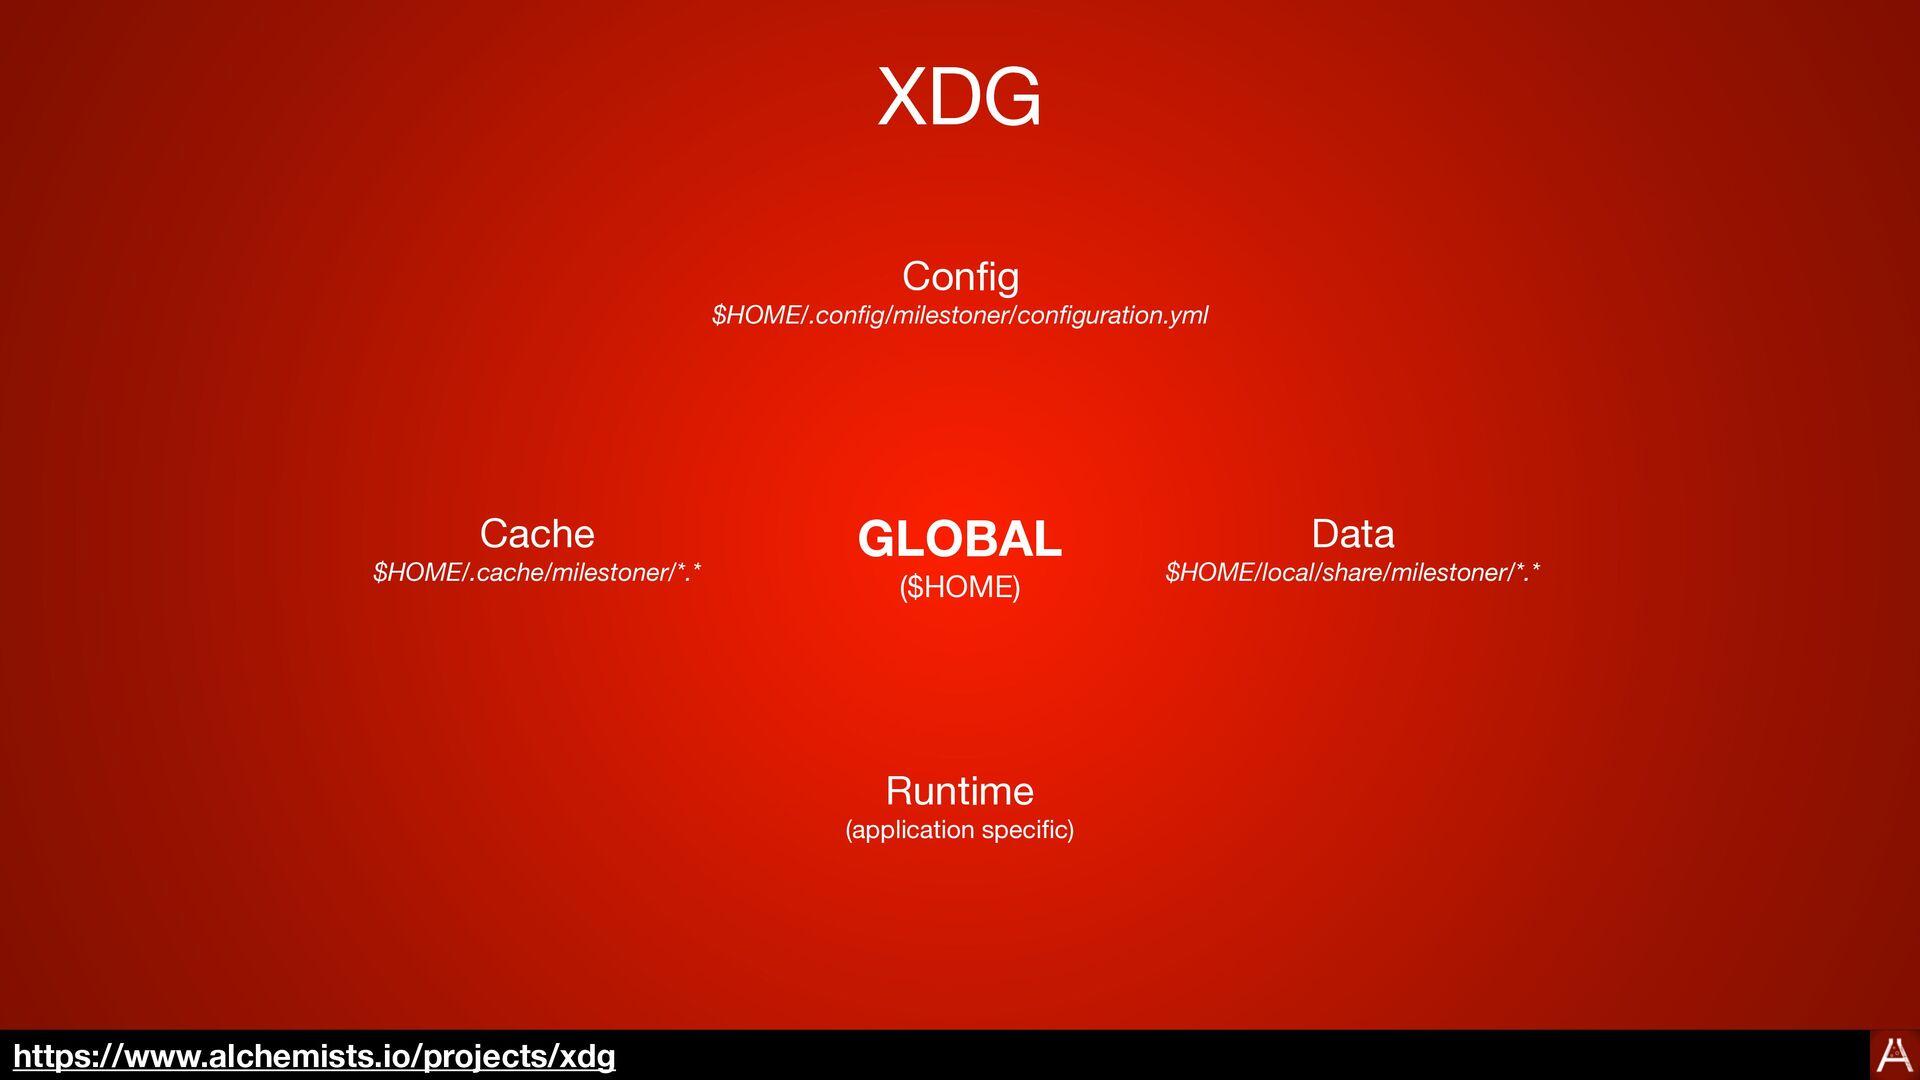 https://www.alchemists.io/projects/runcom Runcom